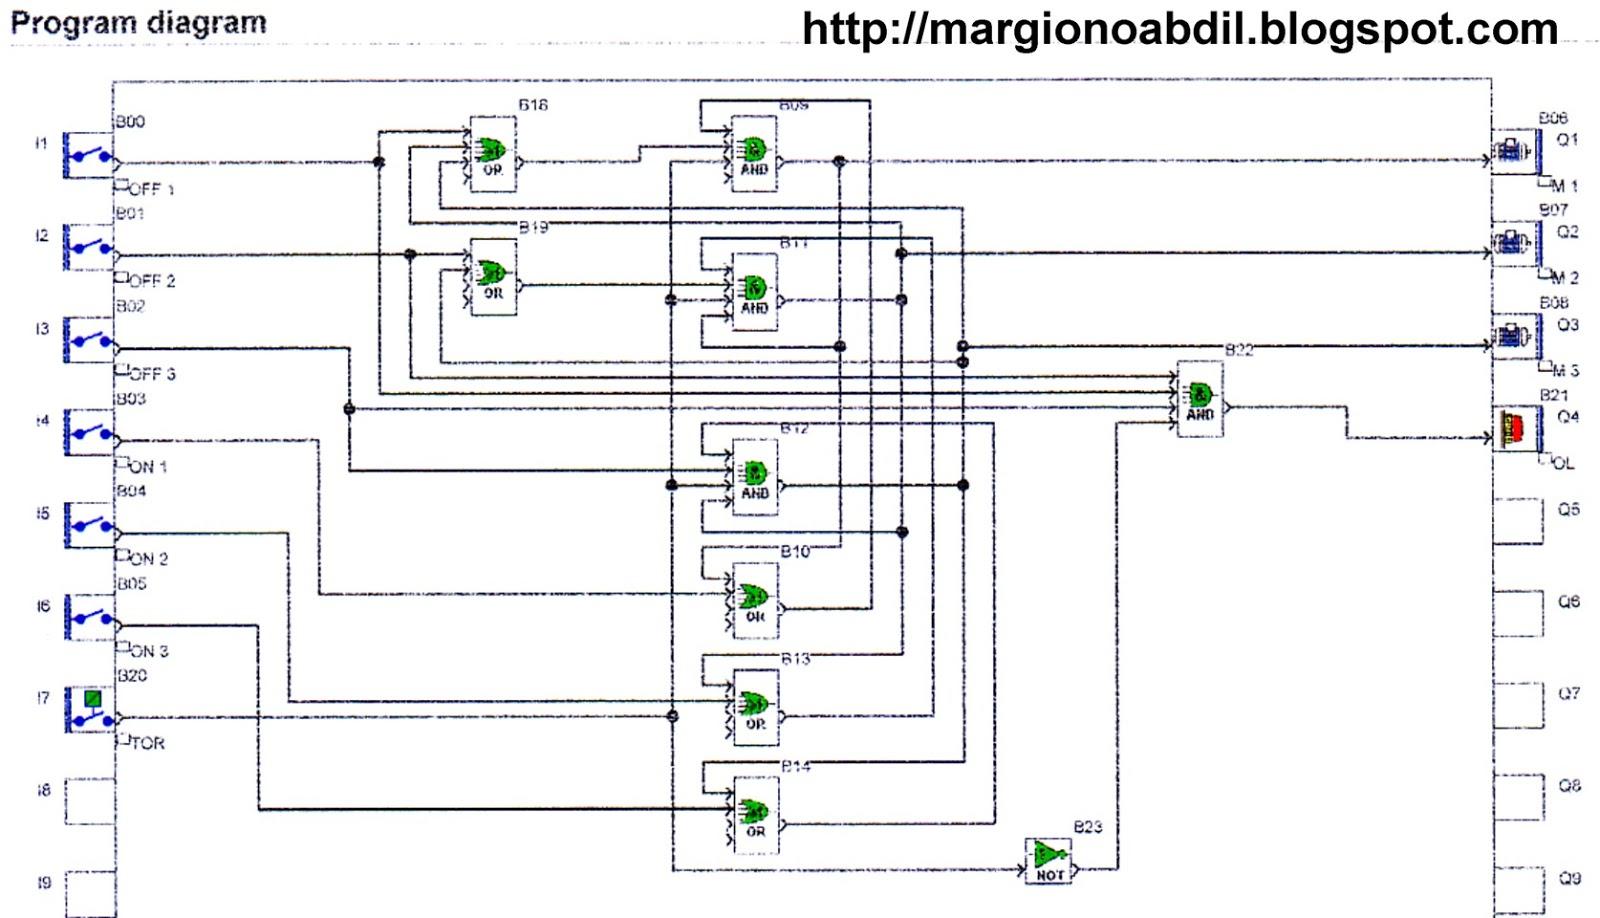 BLOG TEKNIK & VOKASI: Program PLC Untuk Kontrol Motor Belt